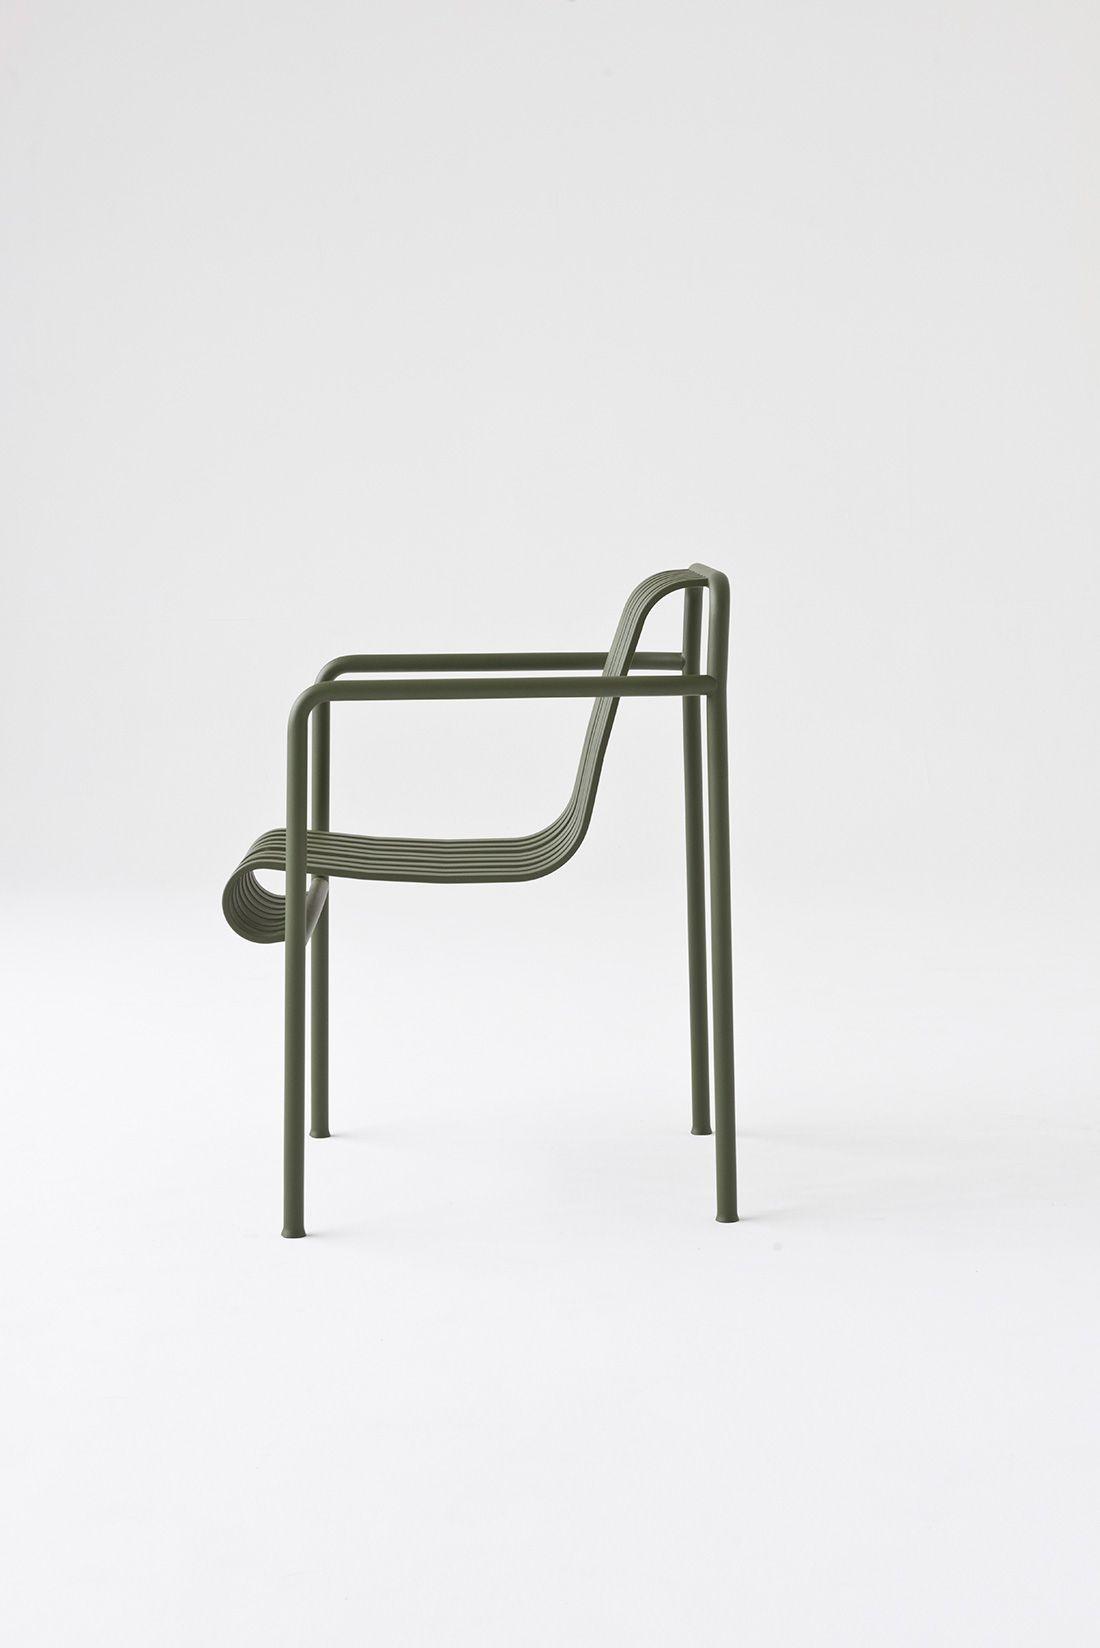 palissade park indesignlive daily connection to. Black Bedroom Furniture Sets. Home Design Ideas